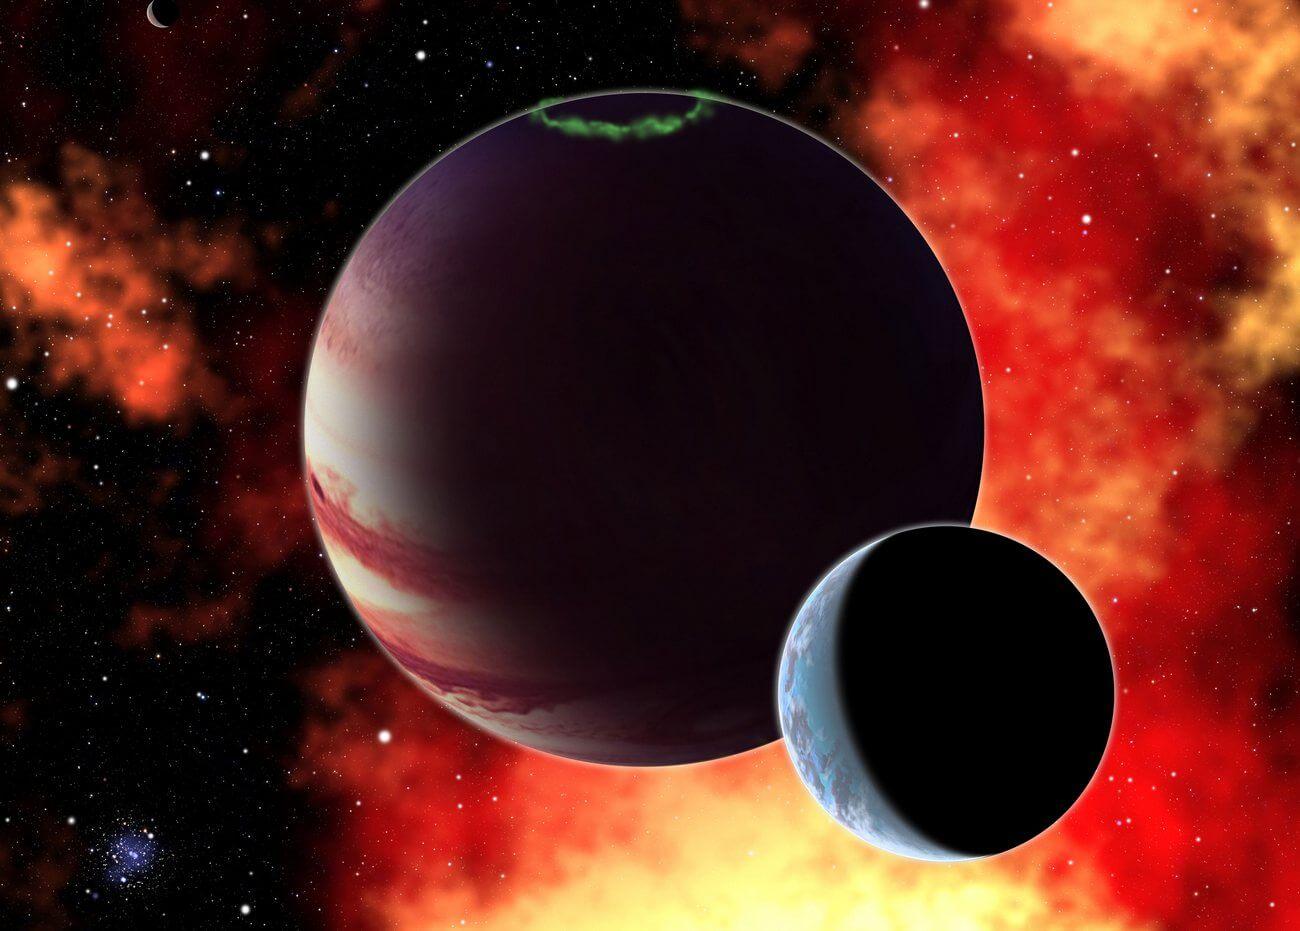 Астрономами обнаружена экзолуна